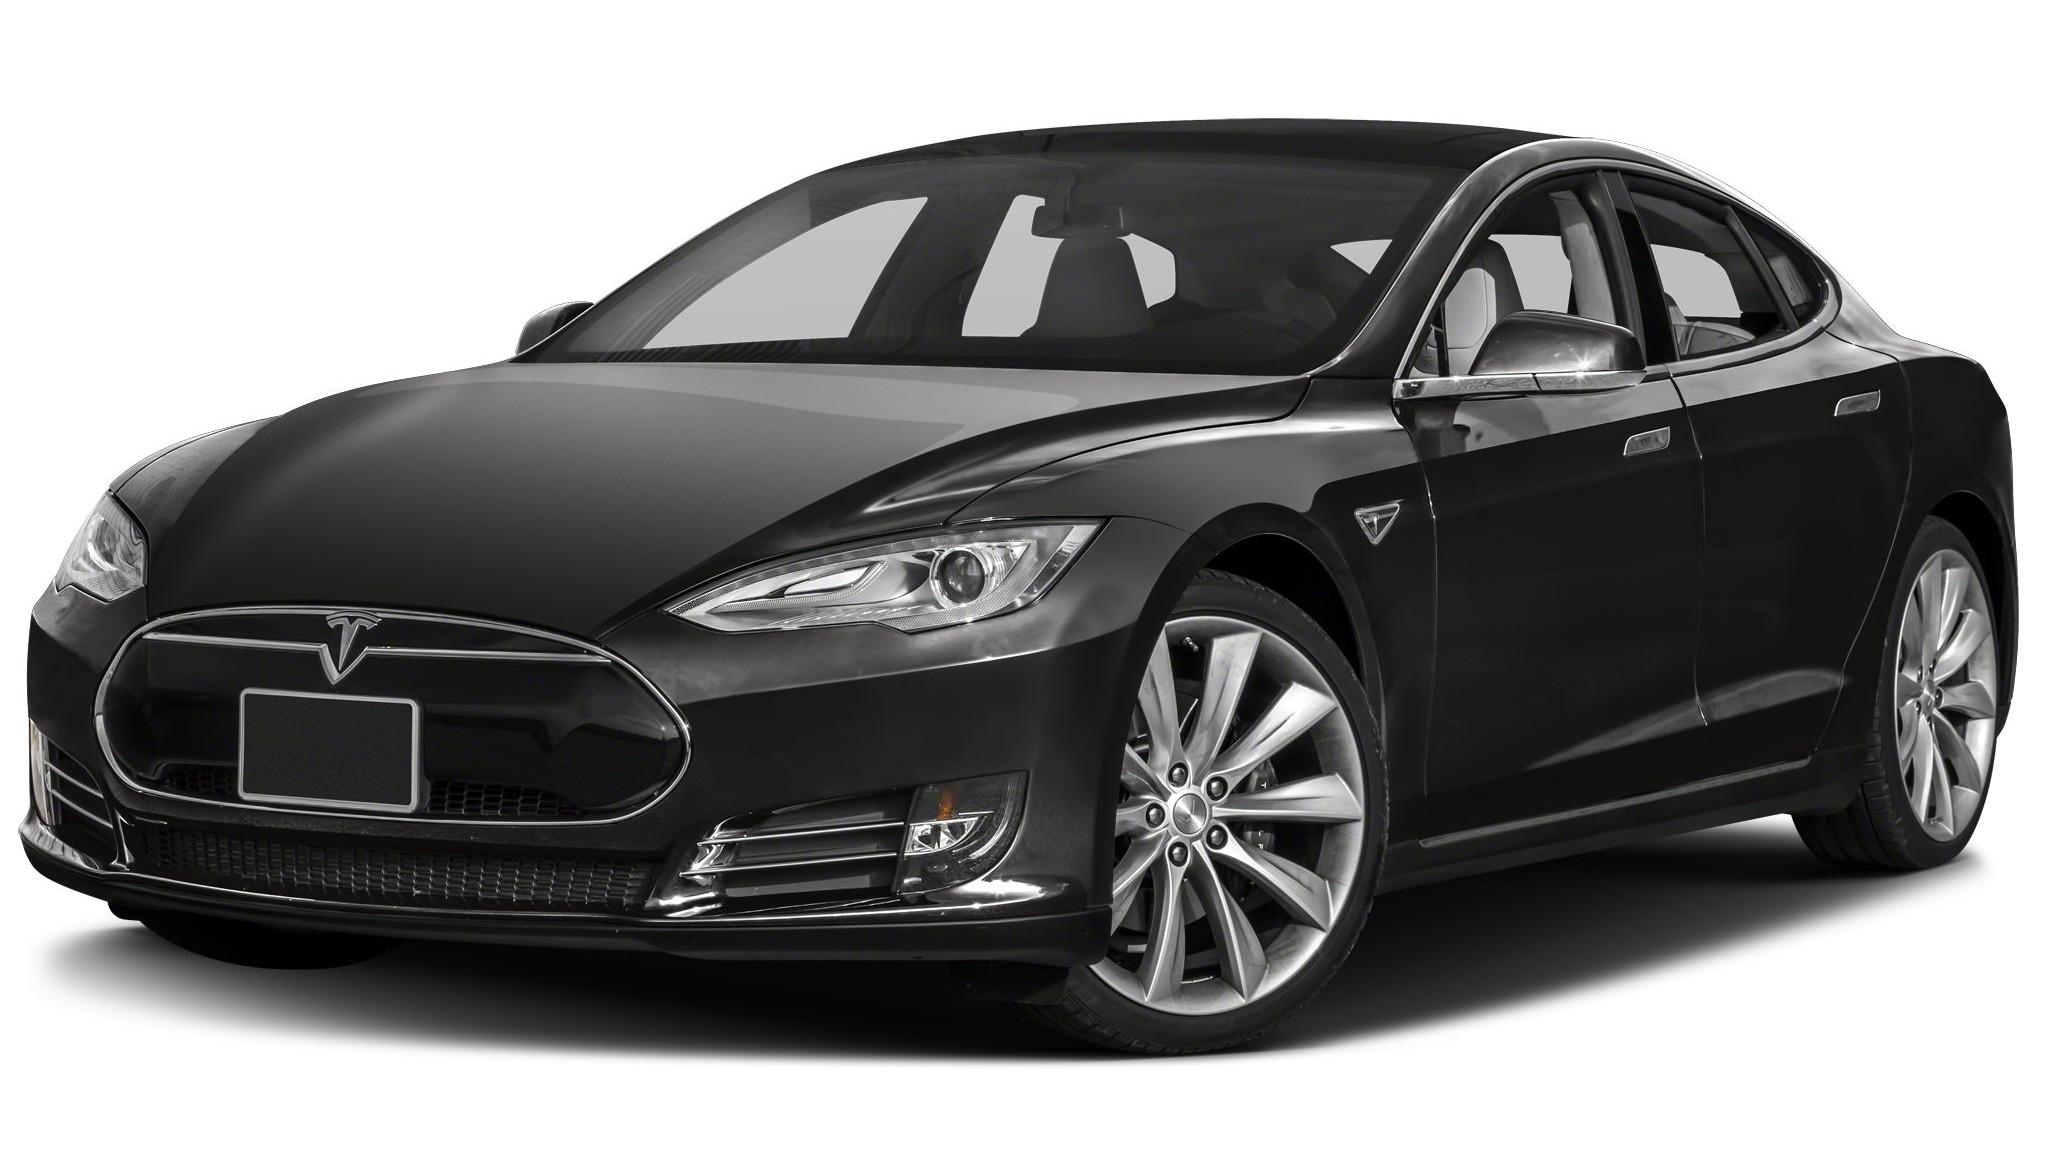 TeslaModelSbr